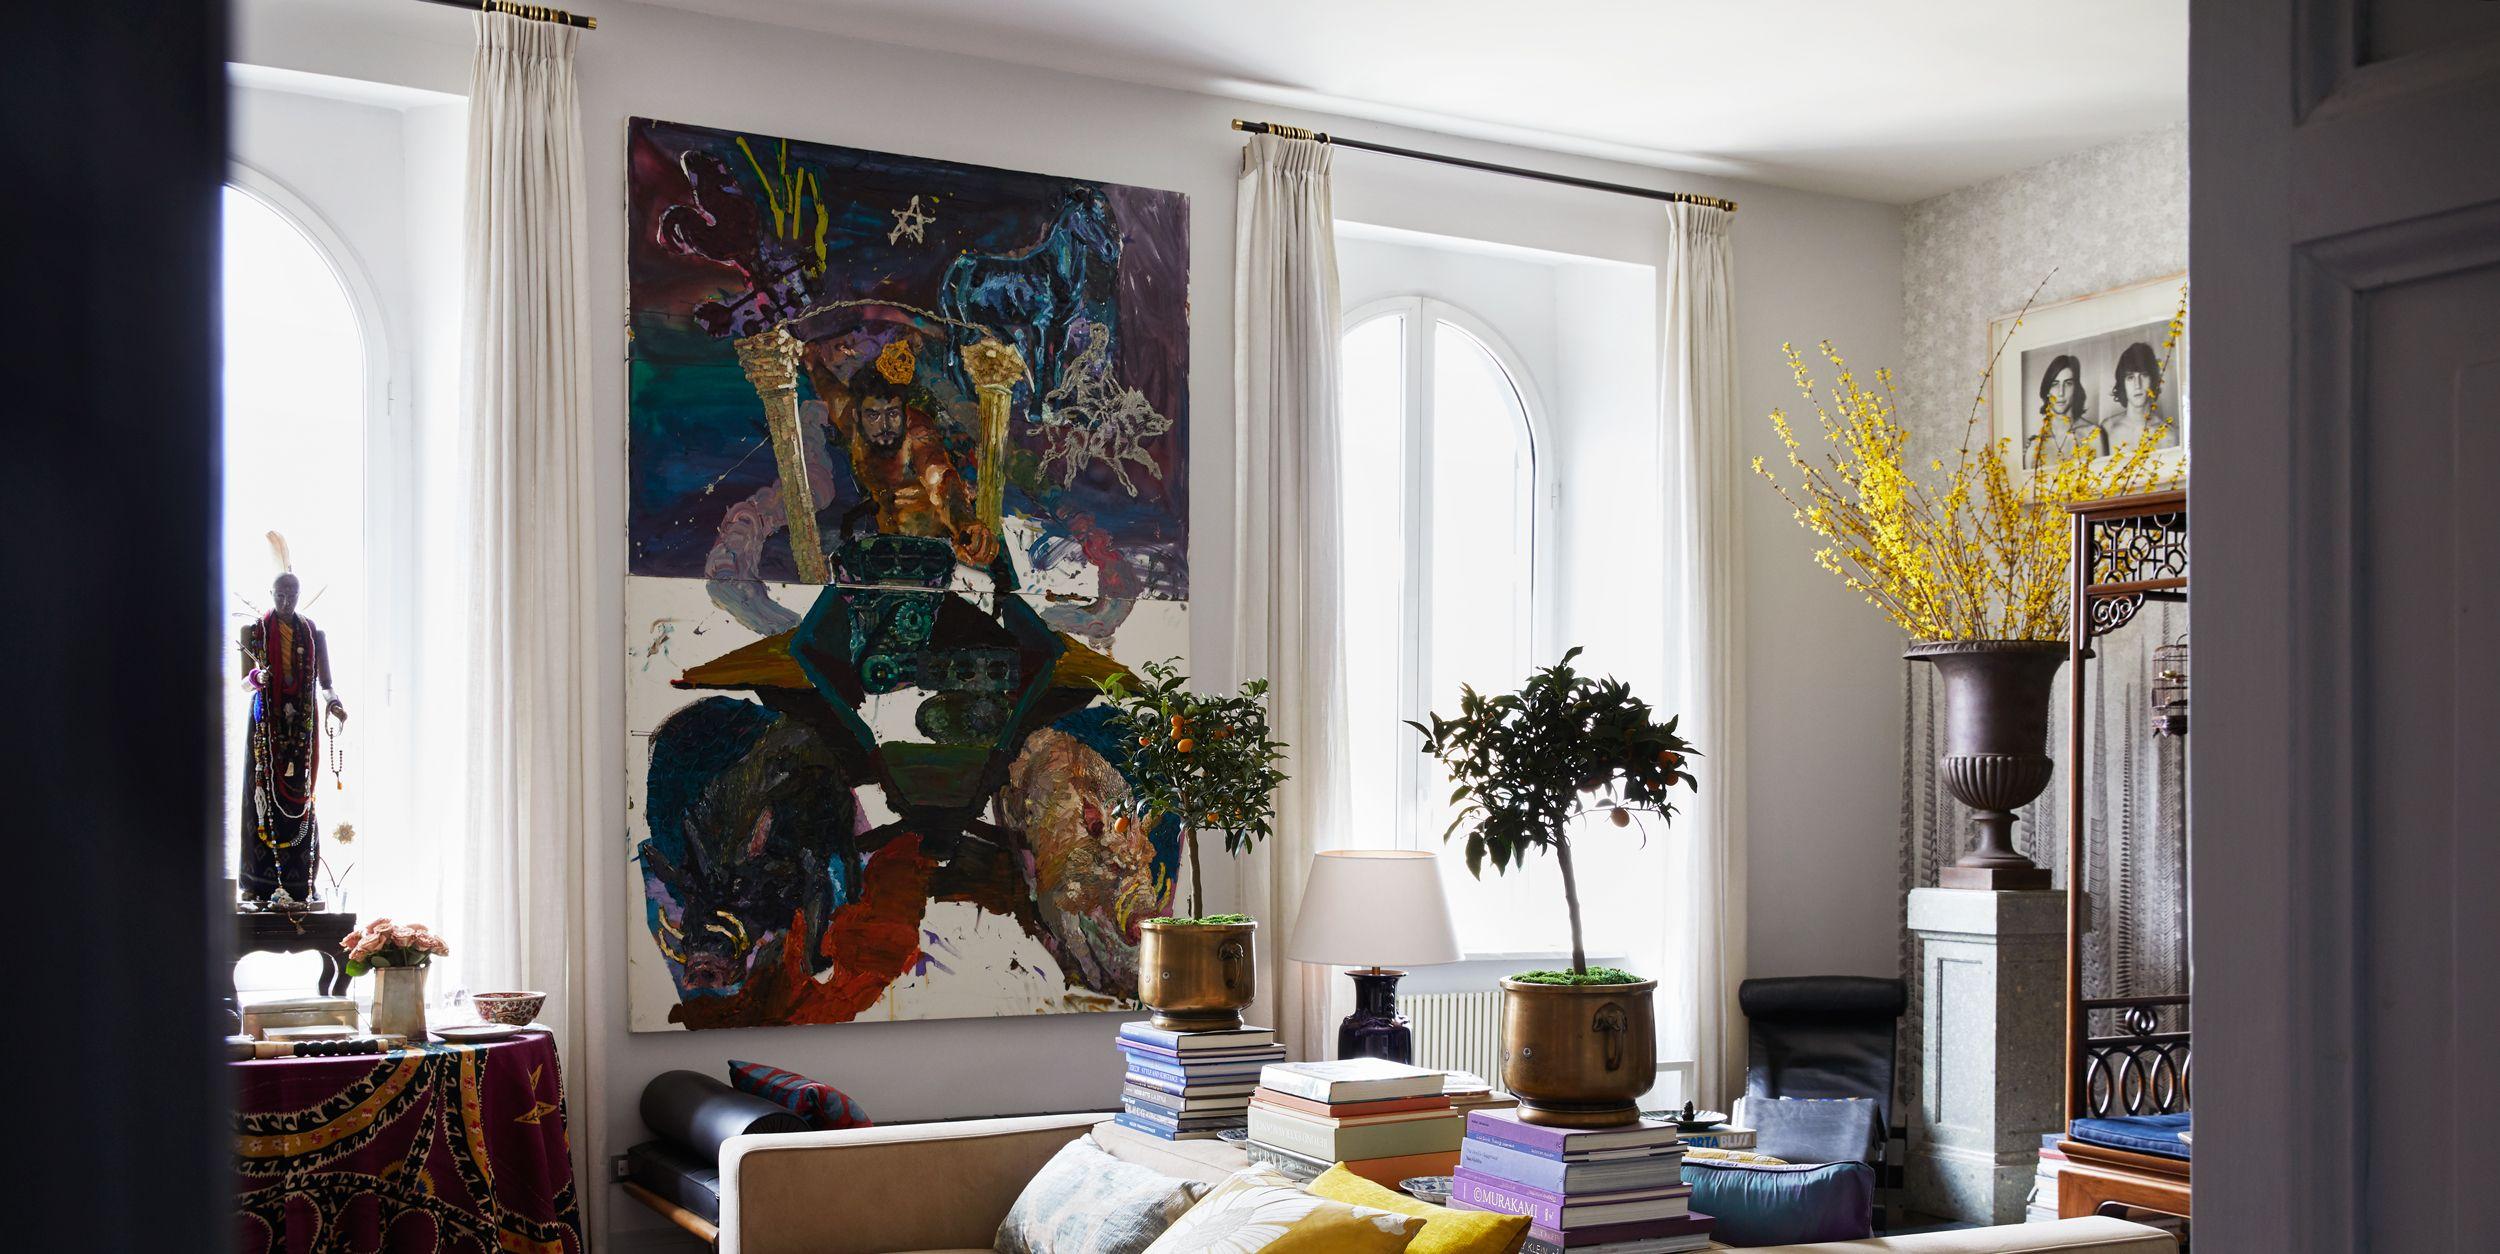 Carlos Souza's Rome Apartment Shows His Lifelong Love of Travel